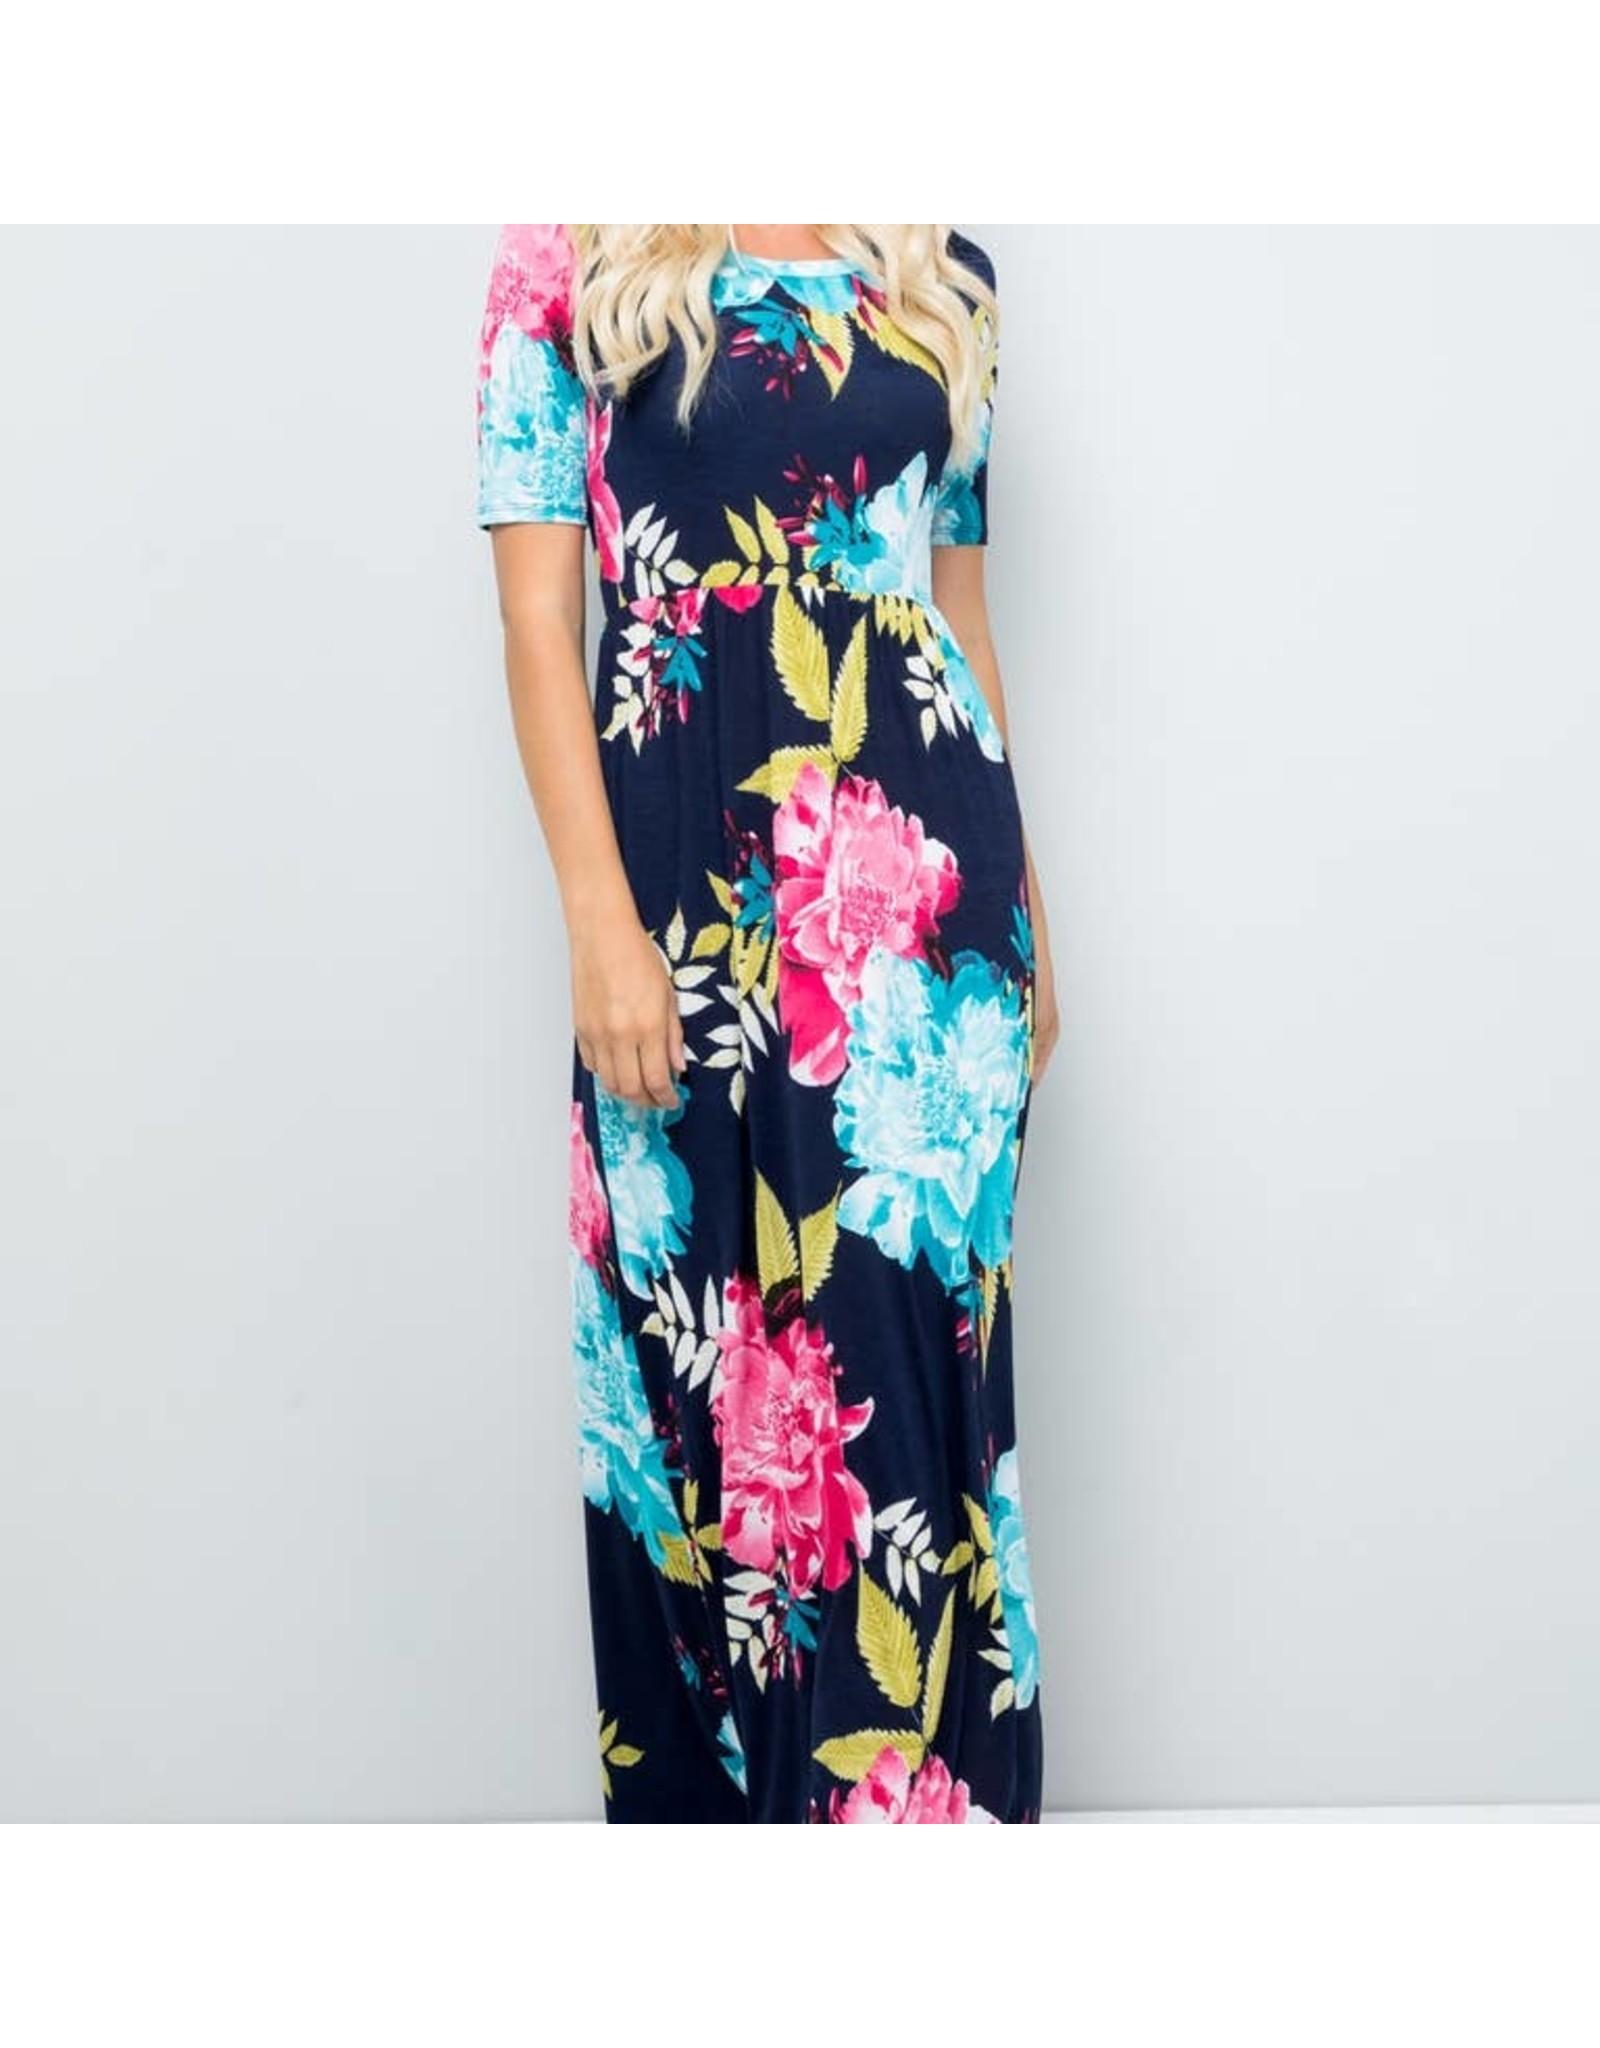 Celeste Clothing Navy Floral Long Dress